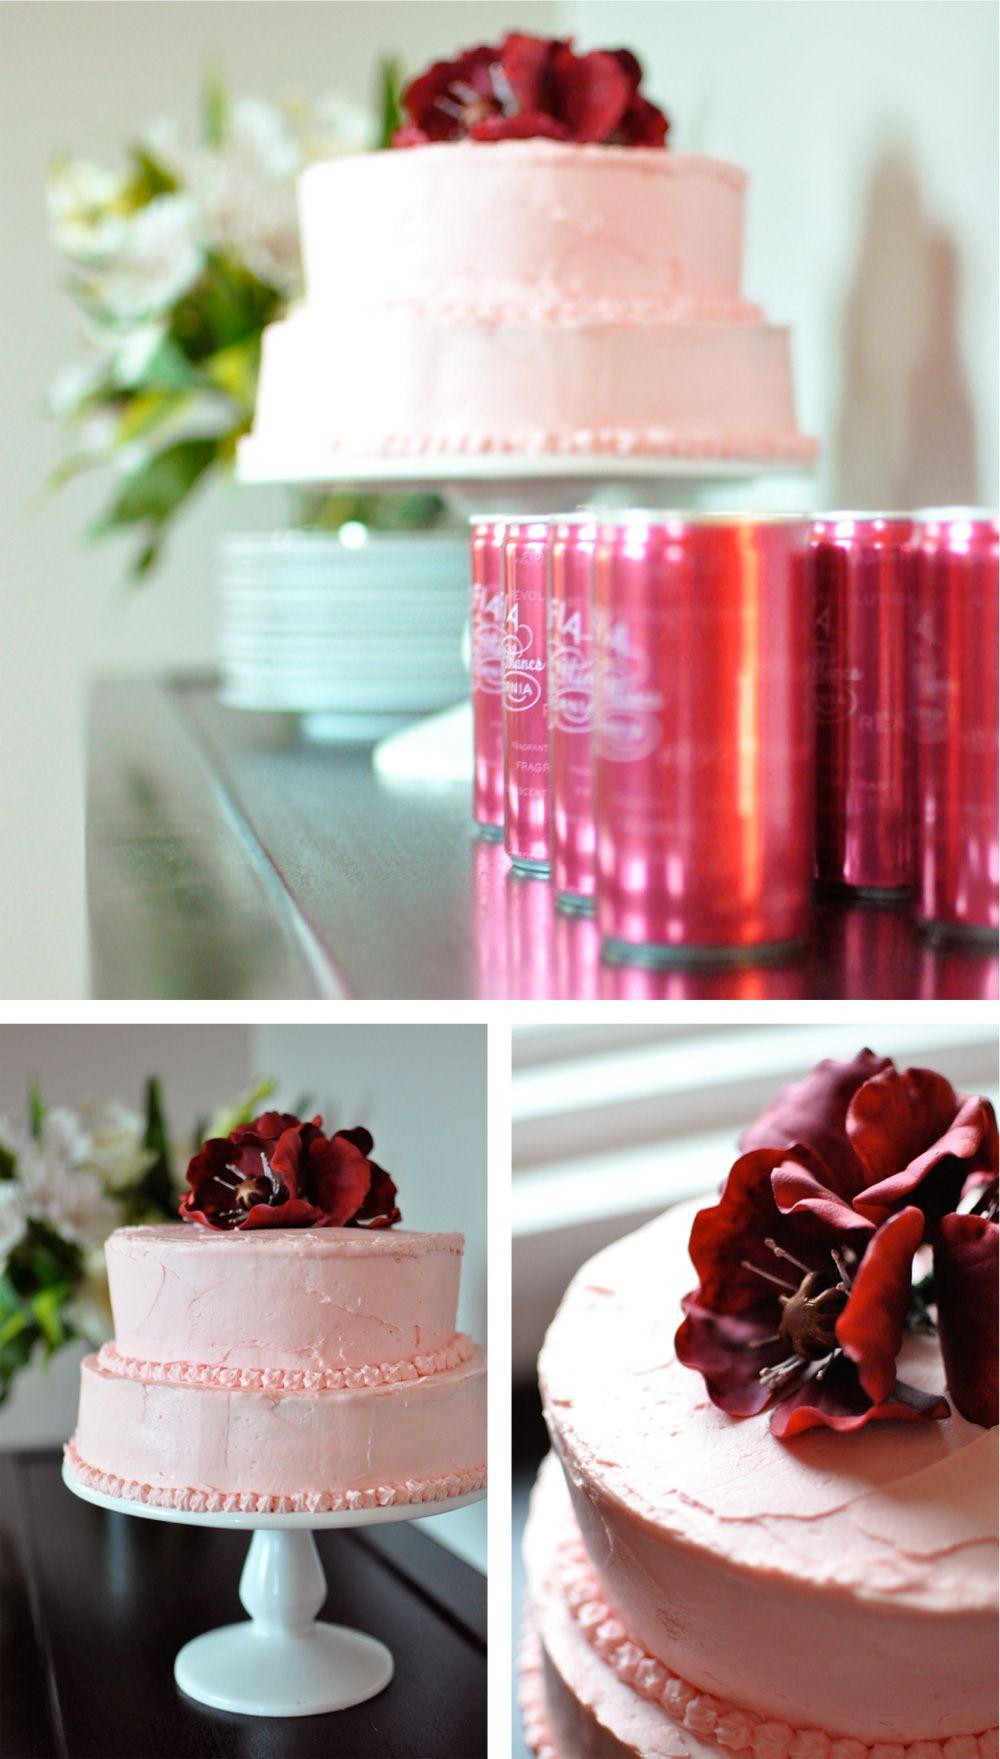 raspberry macaroon favors, pink lemonade, blackberry IZZE, Sophia ...